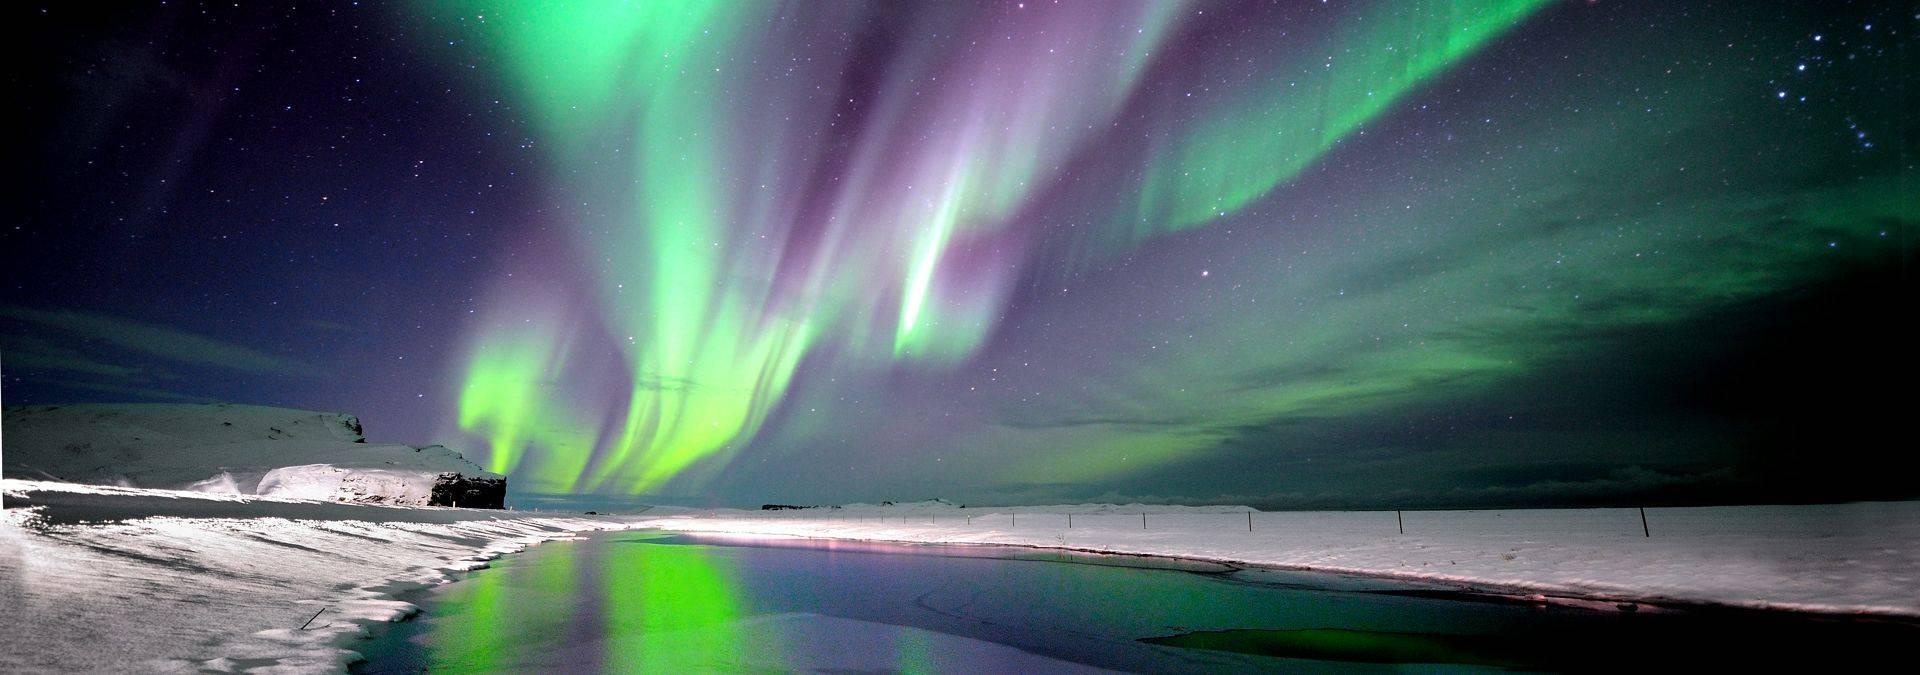 Please credit - ThorirNK from Vik, Iceland  (1).jpg